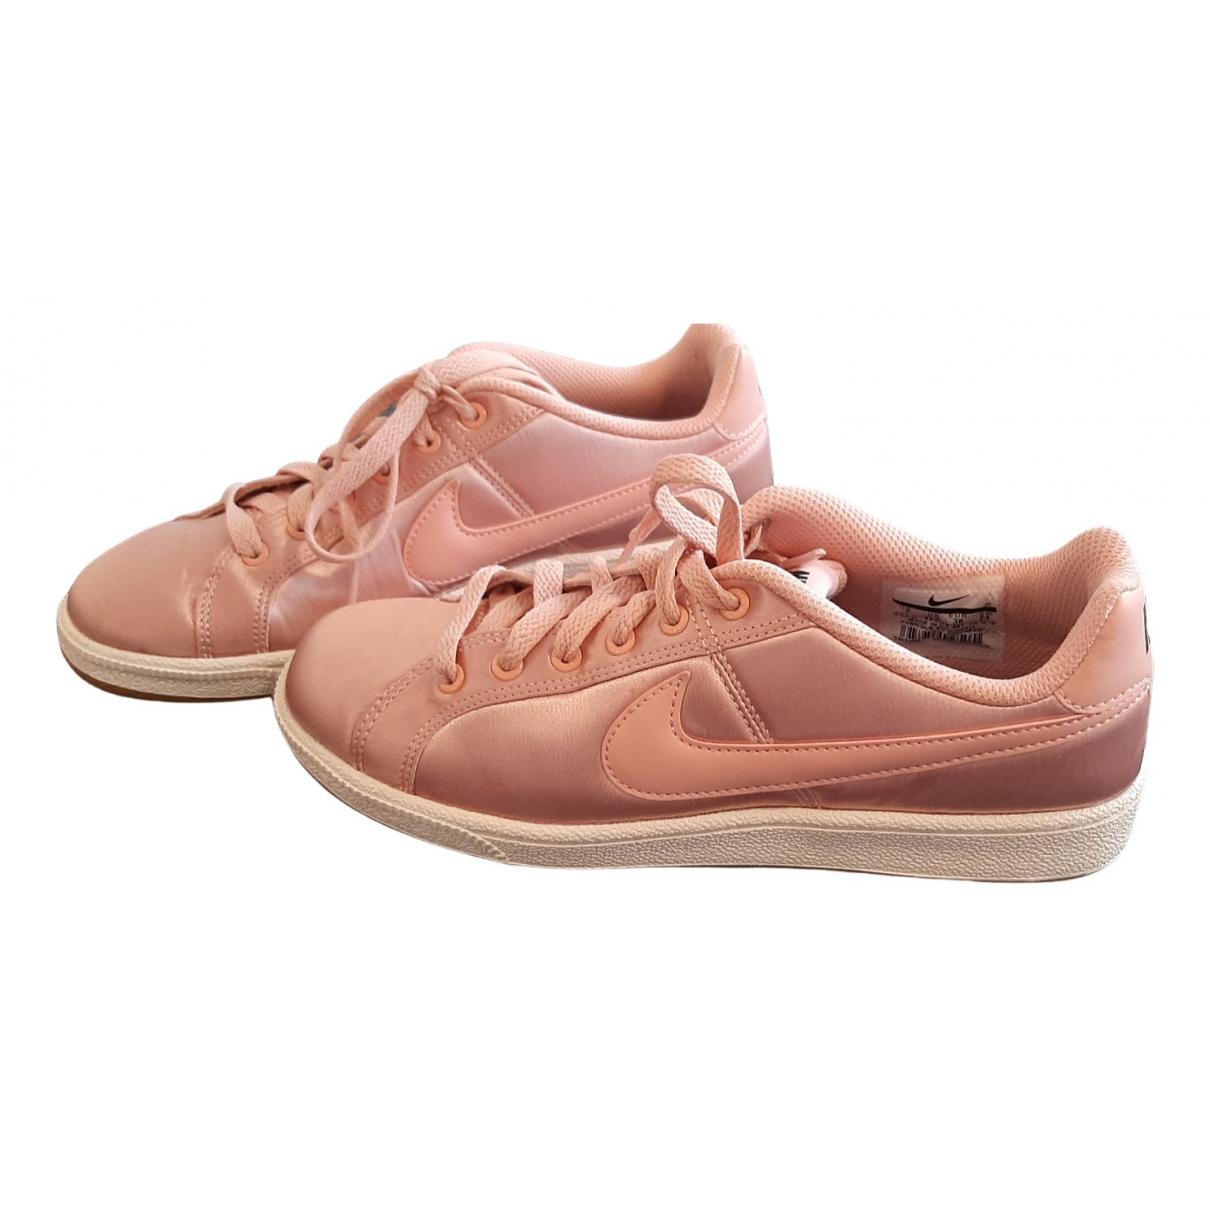 Nike Air Foamposite Pink Faux fur Trainers for Women 38 EU